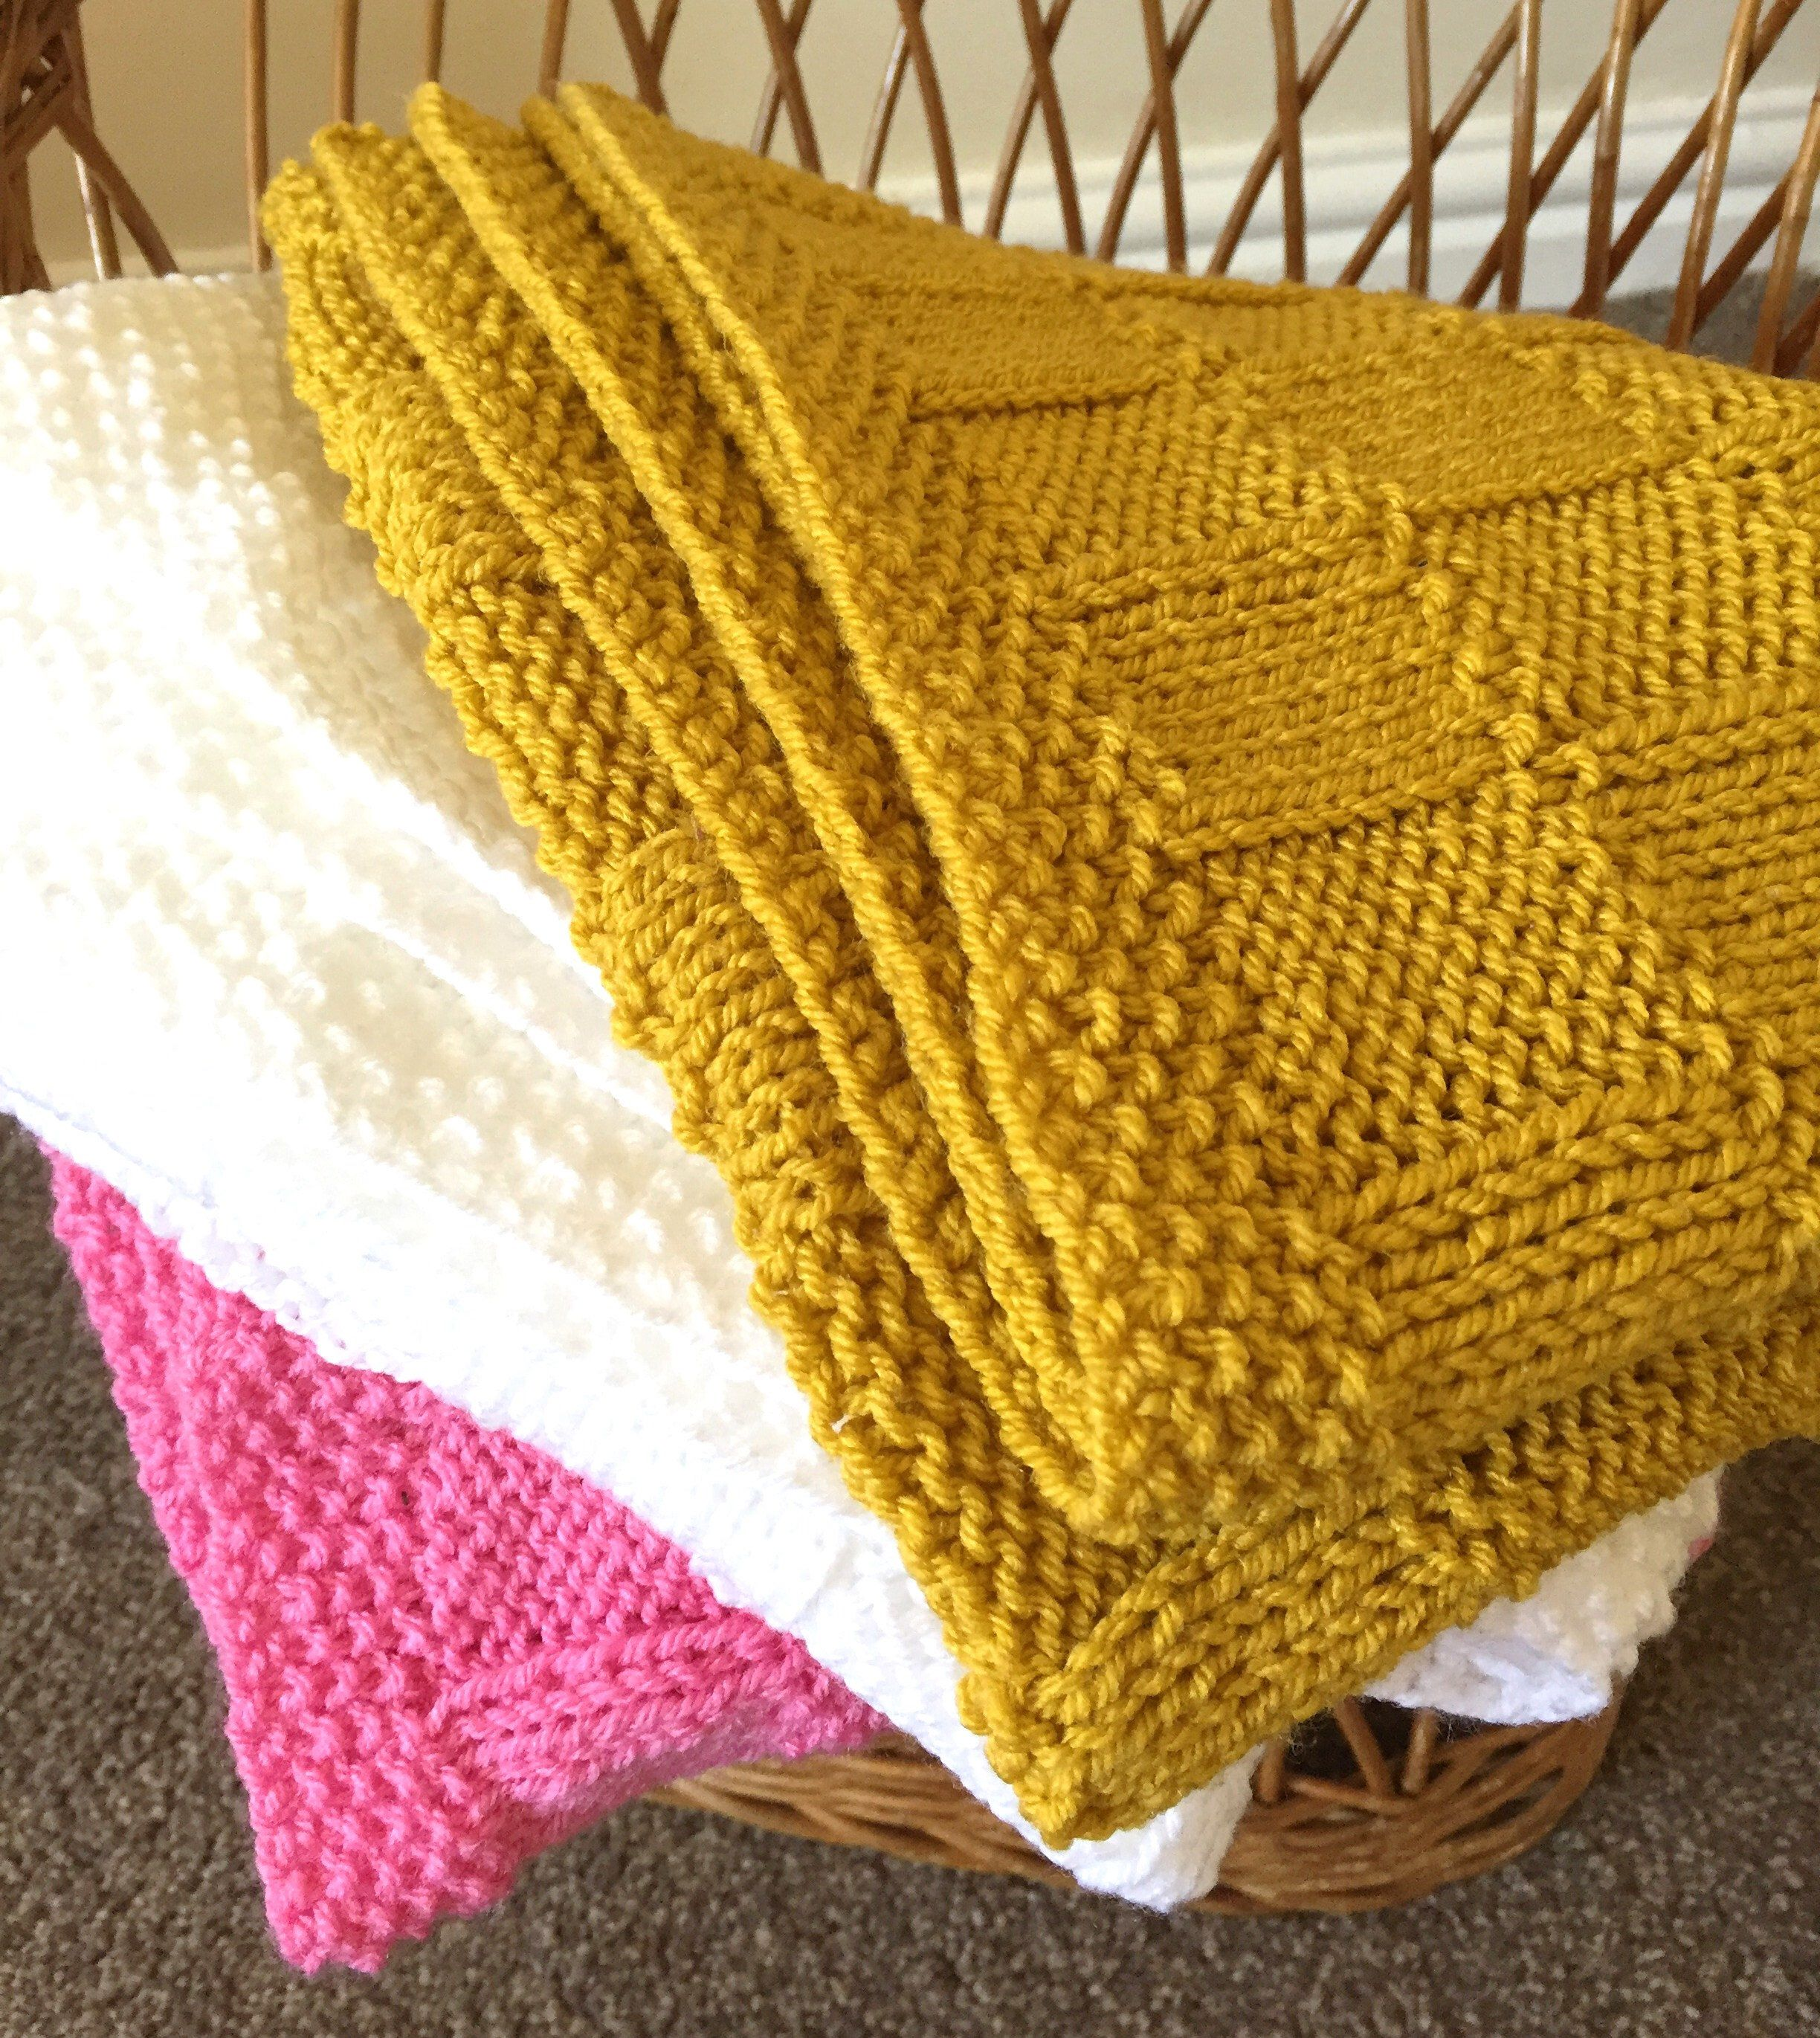 Checks Baby Blanket ~Knitting pattern in 2020 | Baby ...